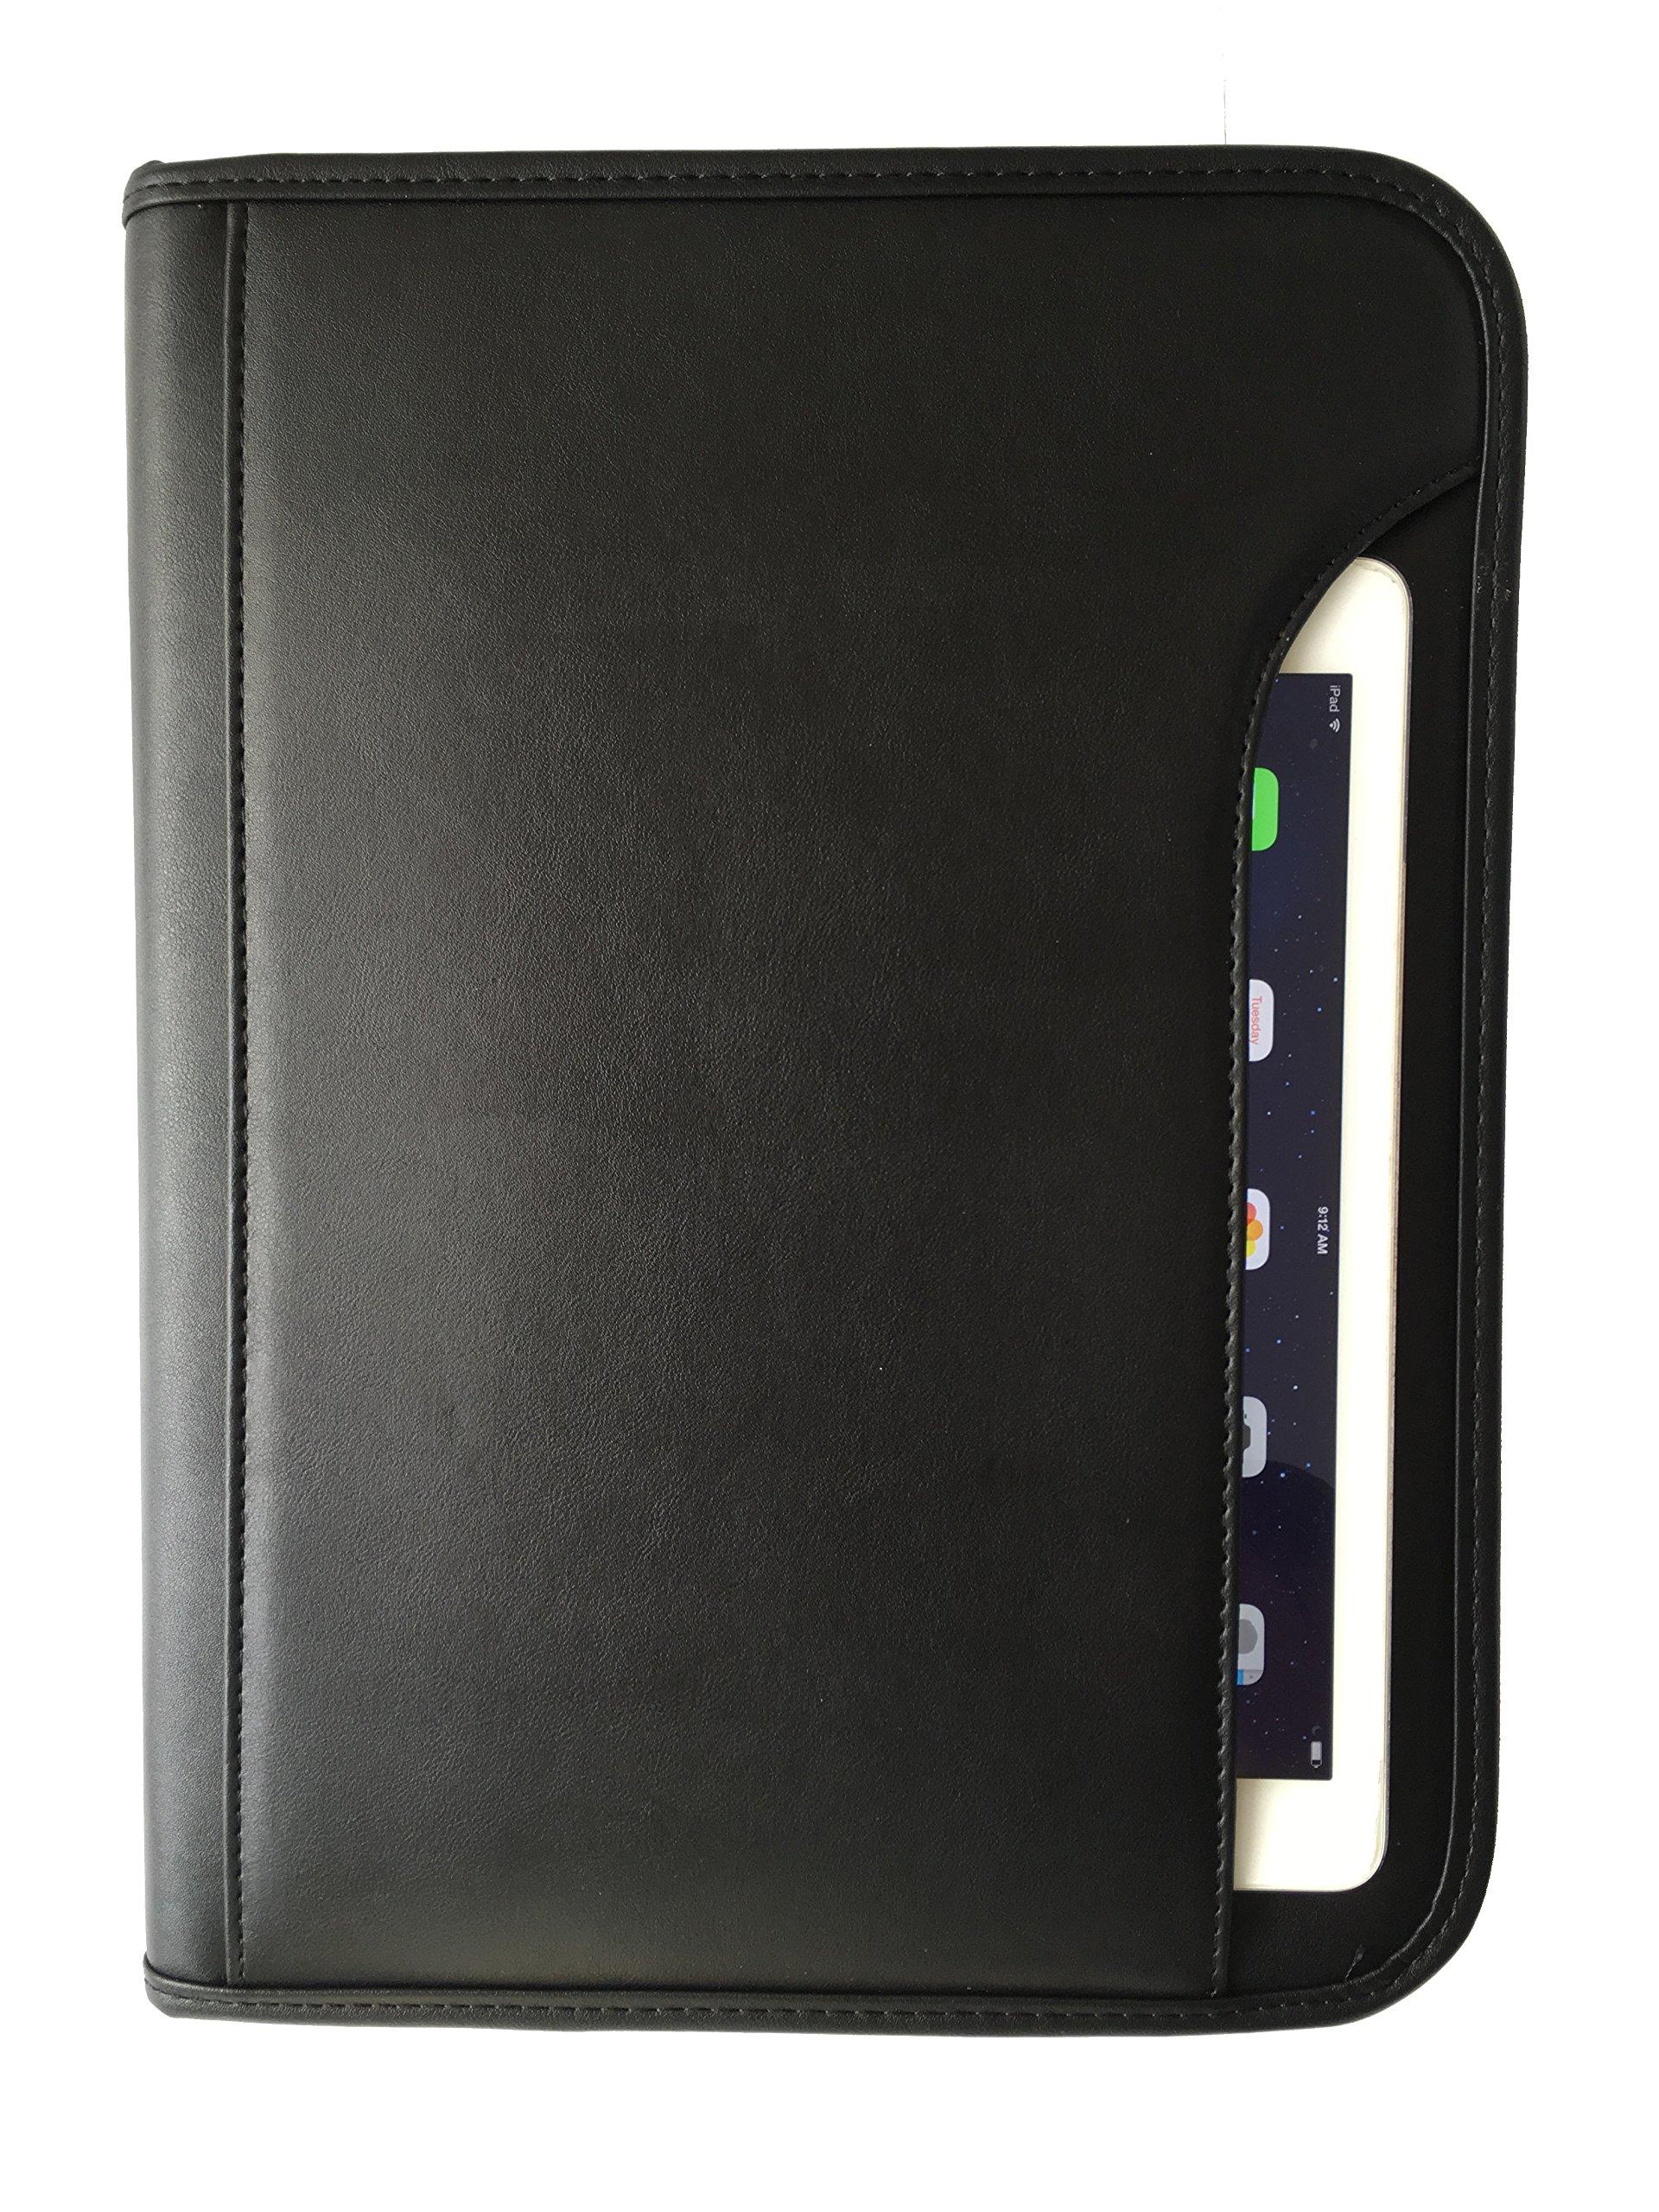 ImpecGear Padfolio Zippered Portfolio Interior 10.1 Inch Tablet Sleeve, Organizer Document Holder W/ Notepad & Pen Slot, Calculator (10'' x 13.5'' x 1.5'') by ImpecGear (Image #1)